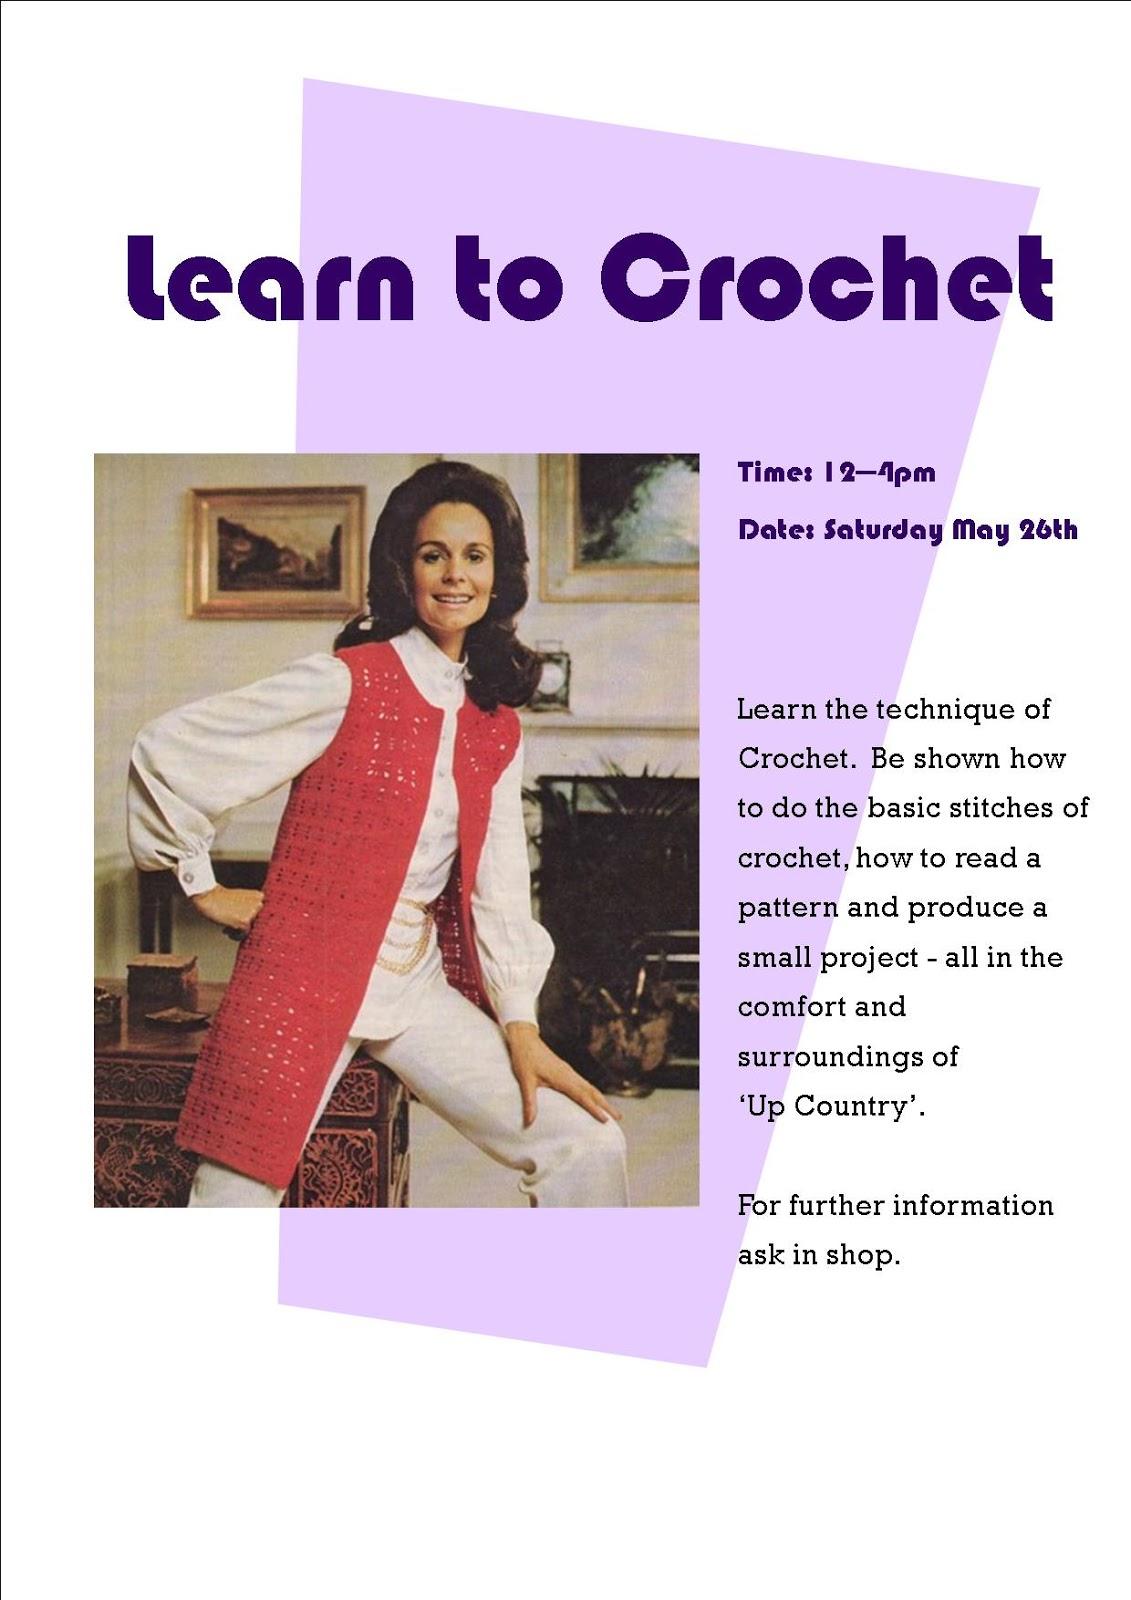 Knitting Club Flyer : Fairislerona why not learn to knit socks or crochet in